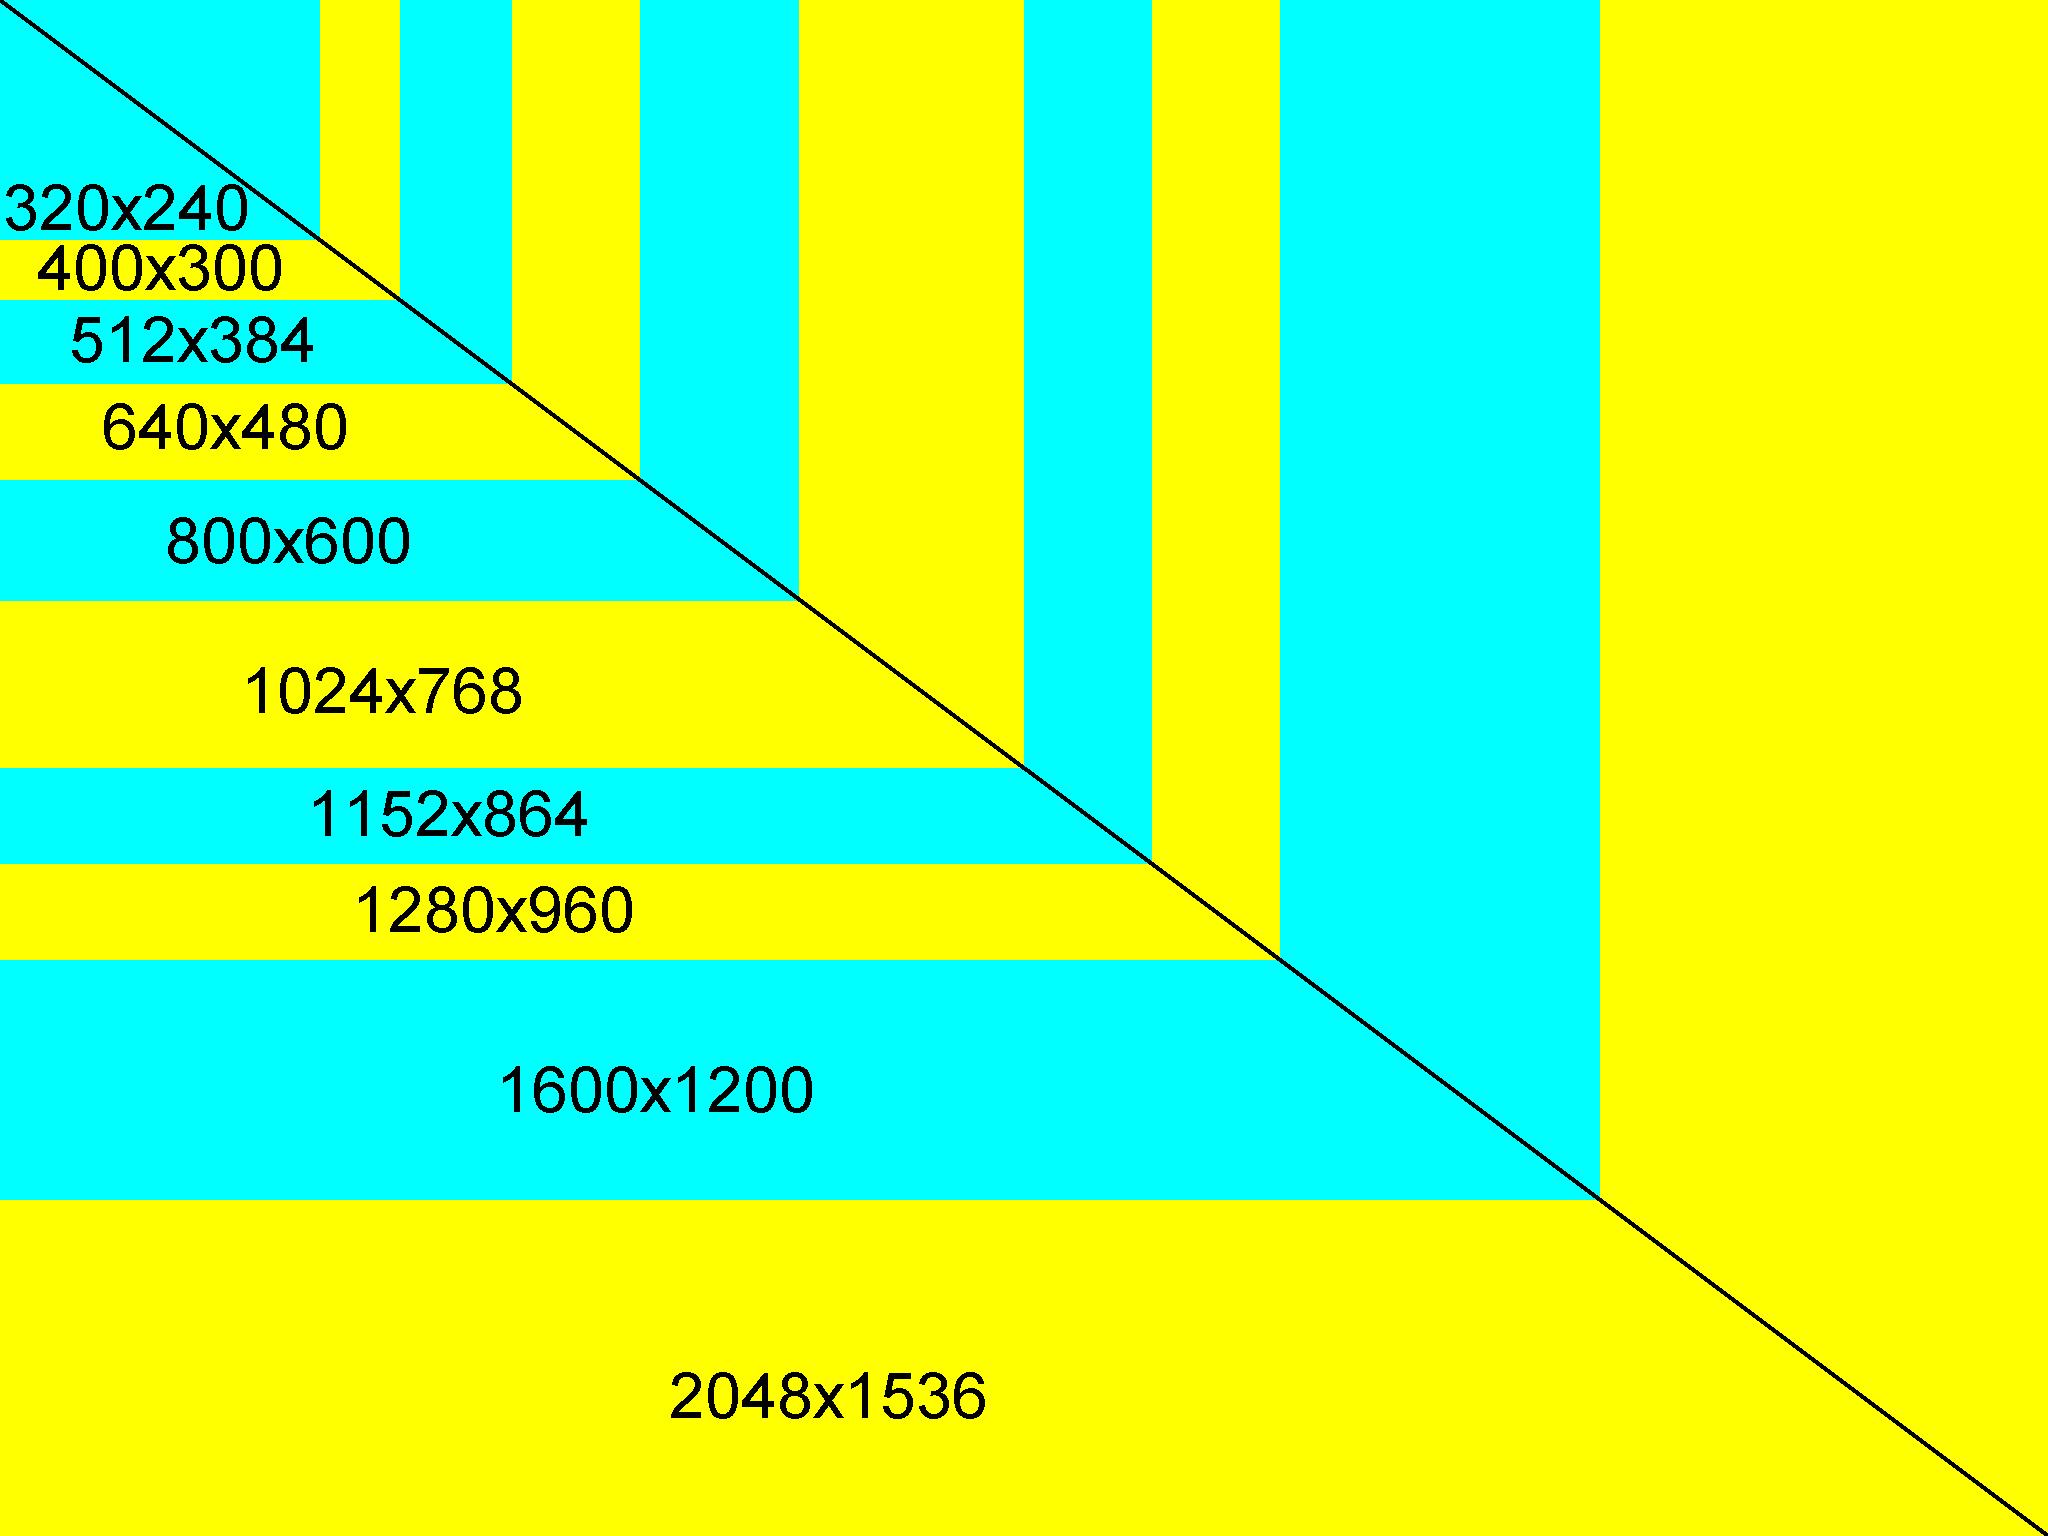 beware's annoyances - tft flatpanel aspect ratio